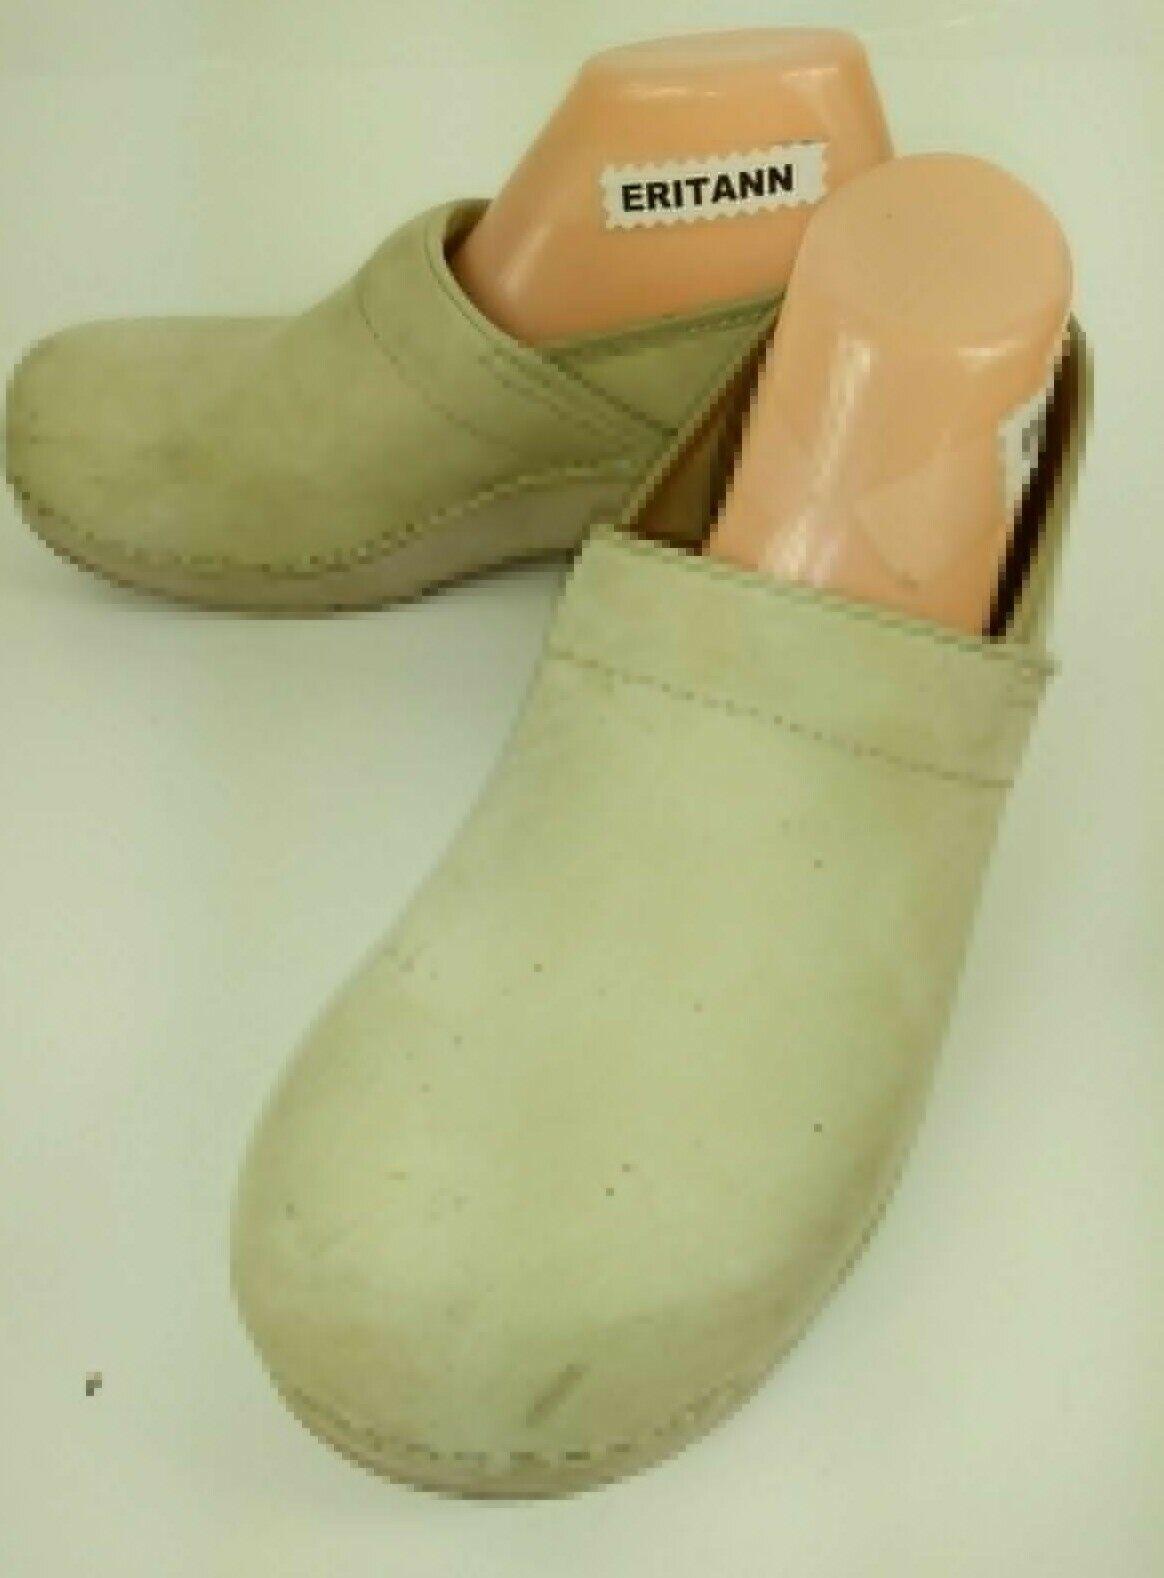 DANSKO Womens shoes EU 42 US 11.5 off white Nubuck Leather Work Clogs 1108